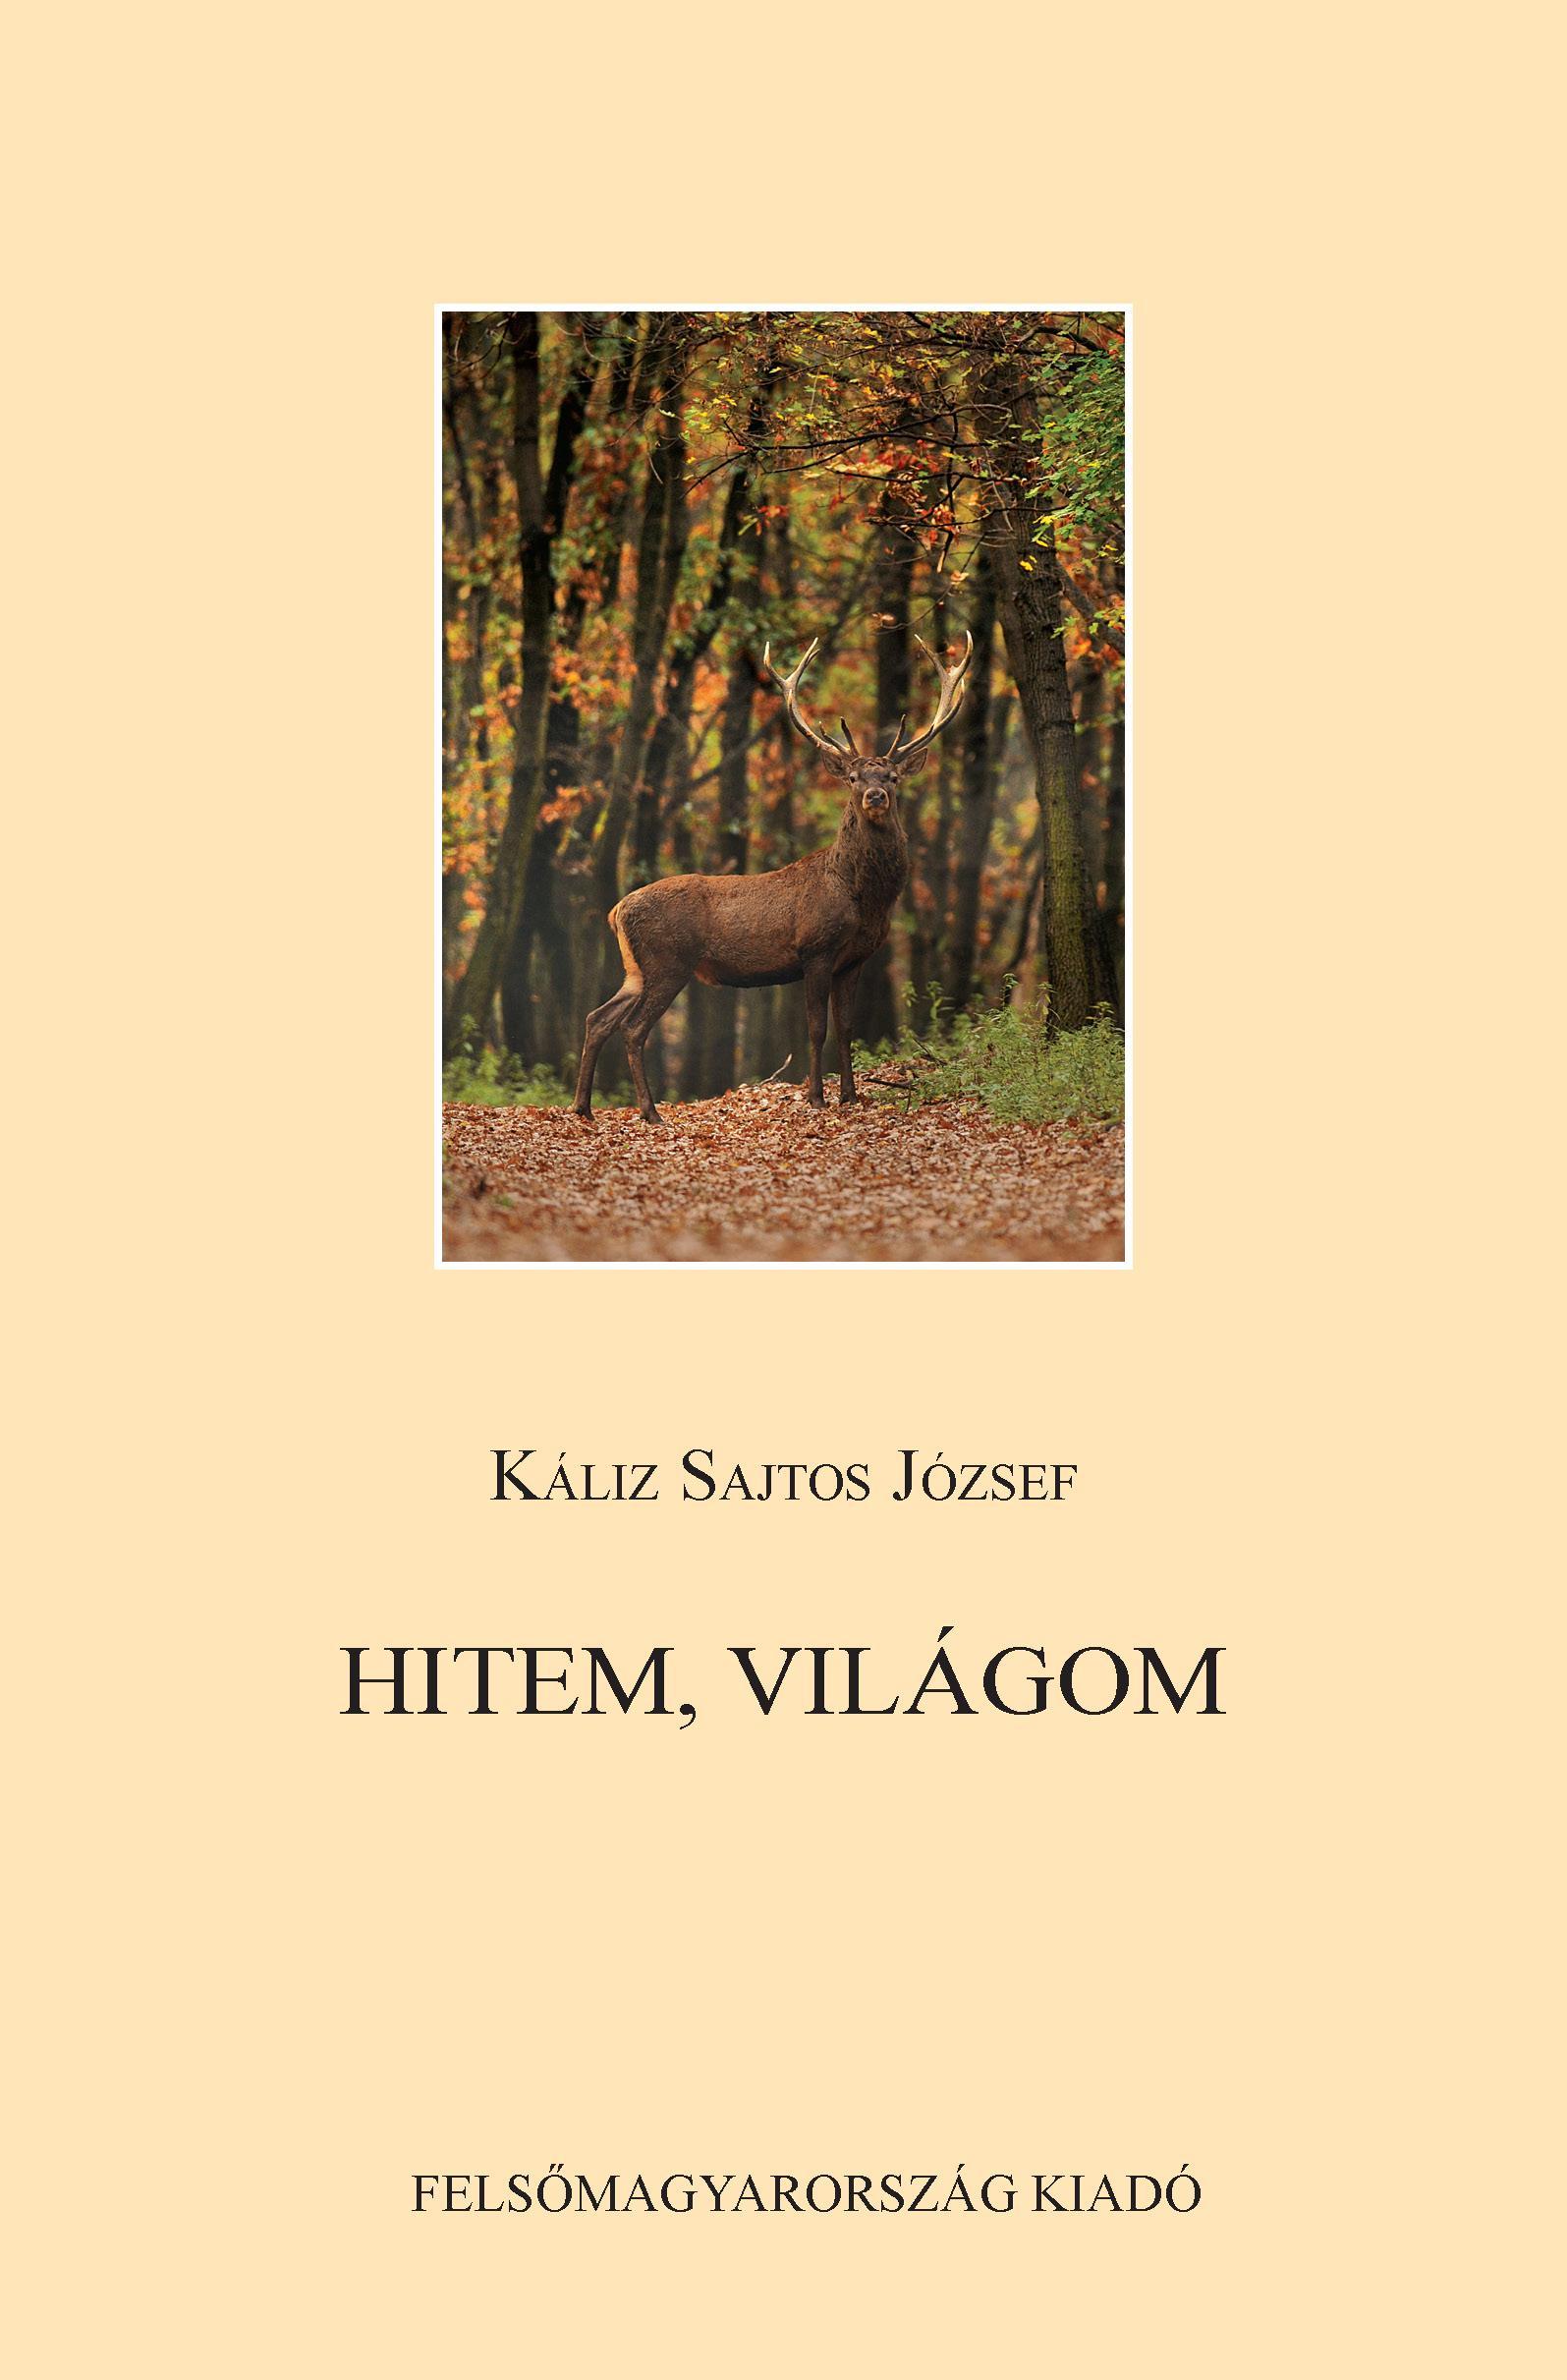 HITEM, VILÁGOM